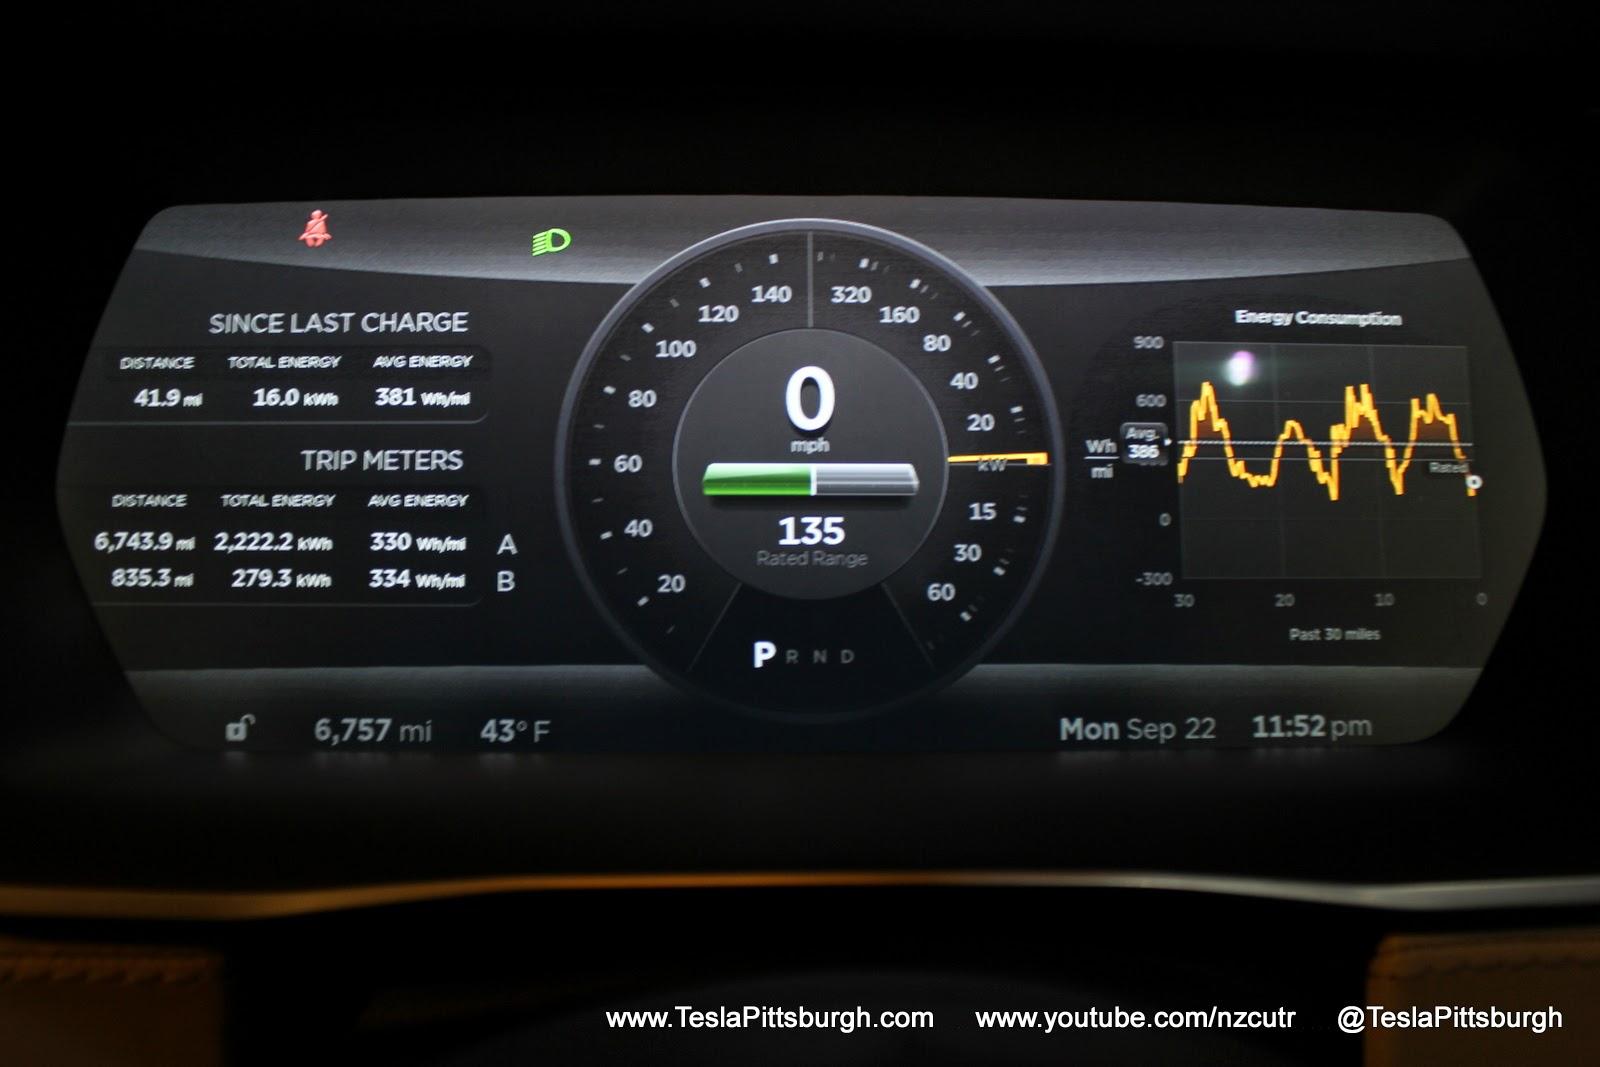 Tesla-Firmware6-13